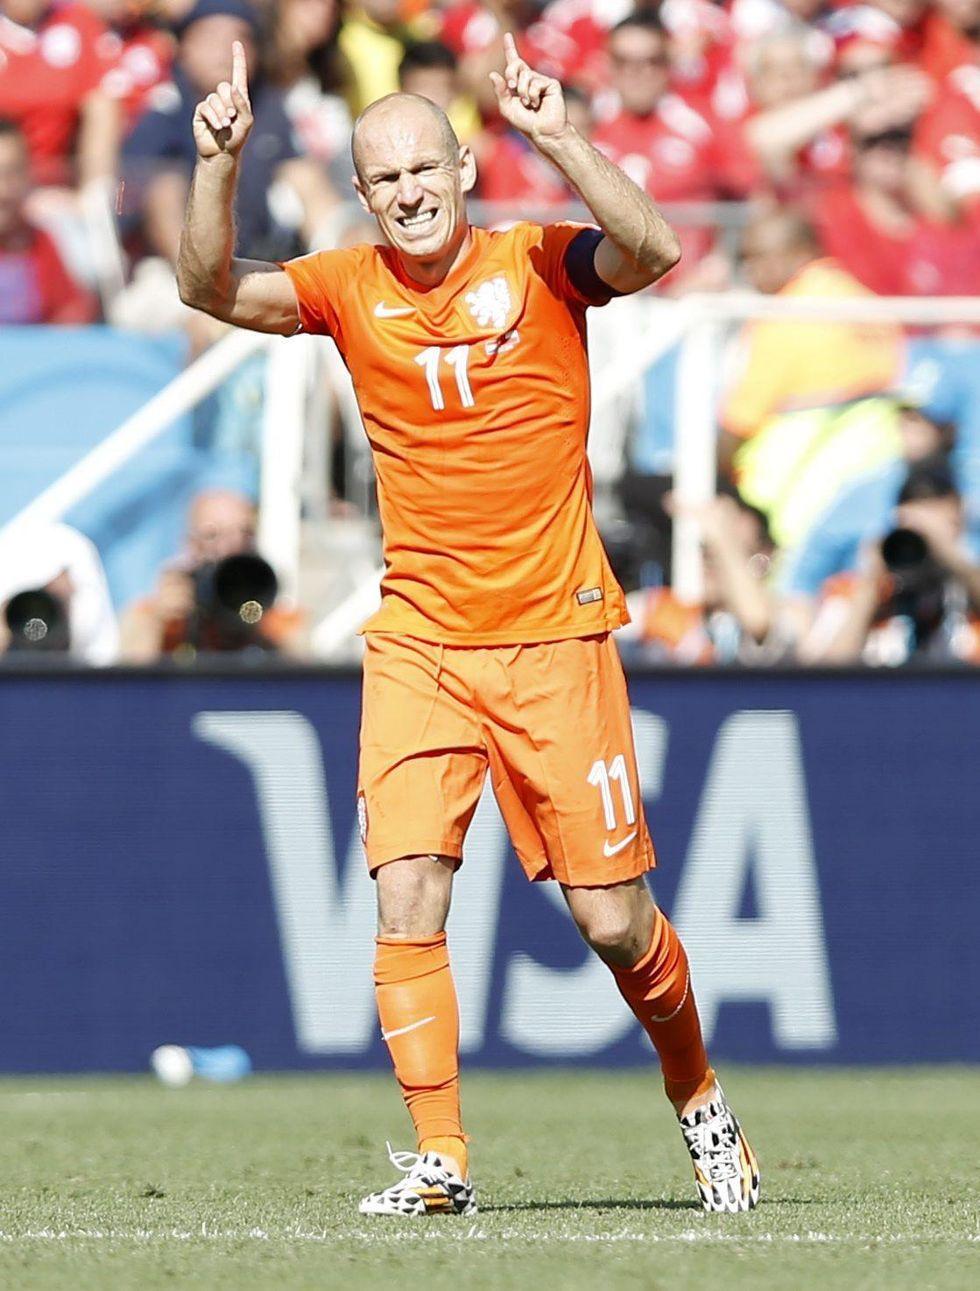 Tris Olanda, Cile battuto. Spagna, dolce addio